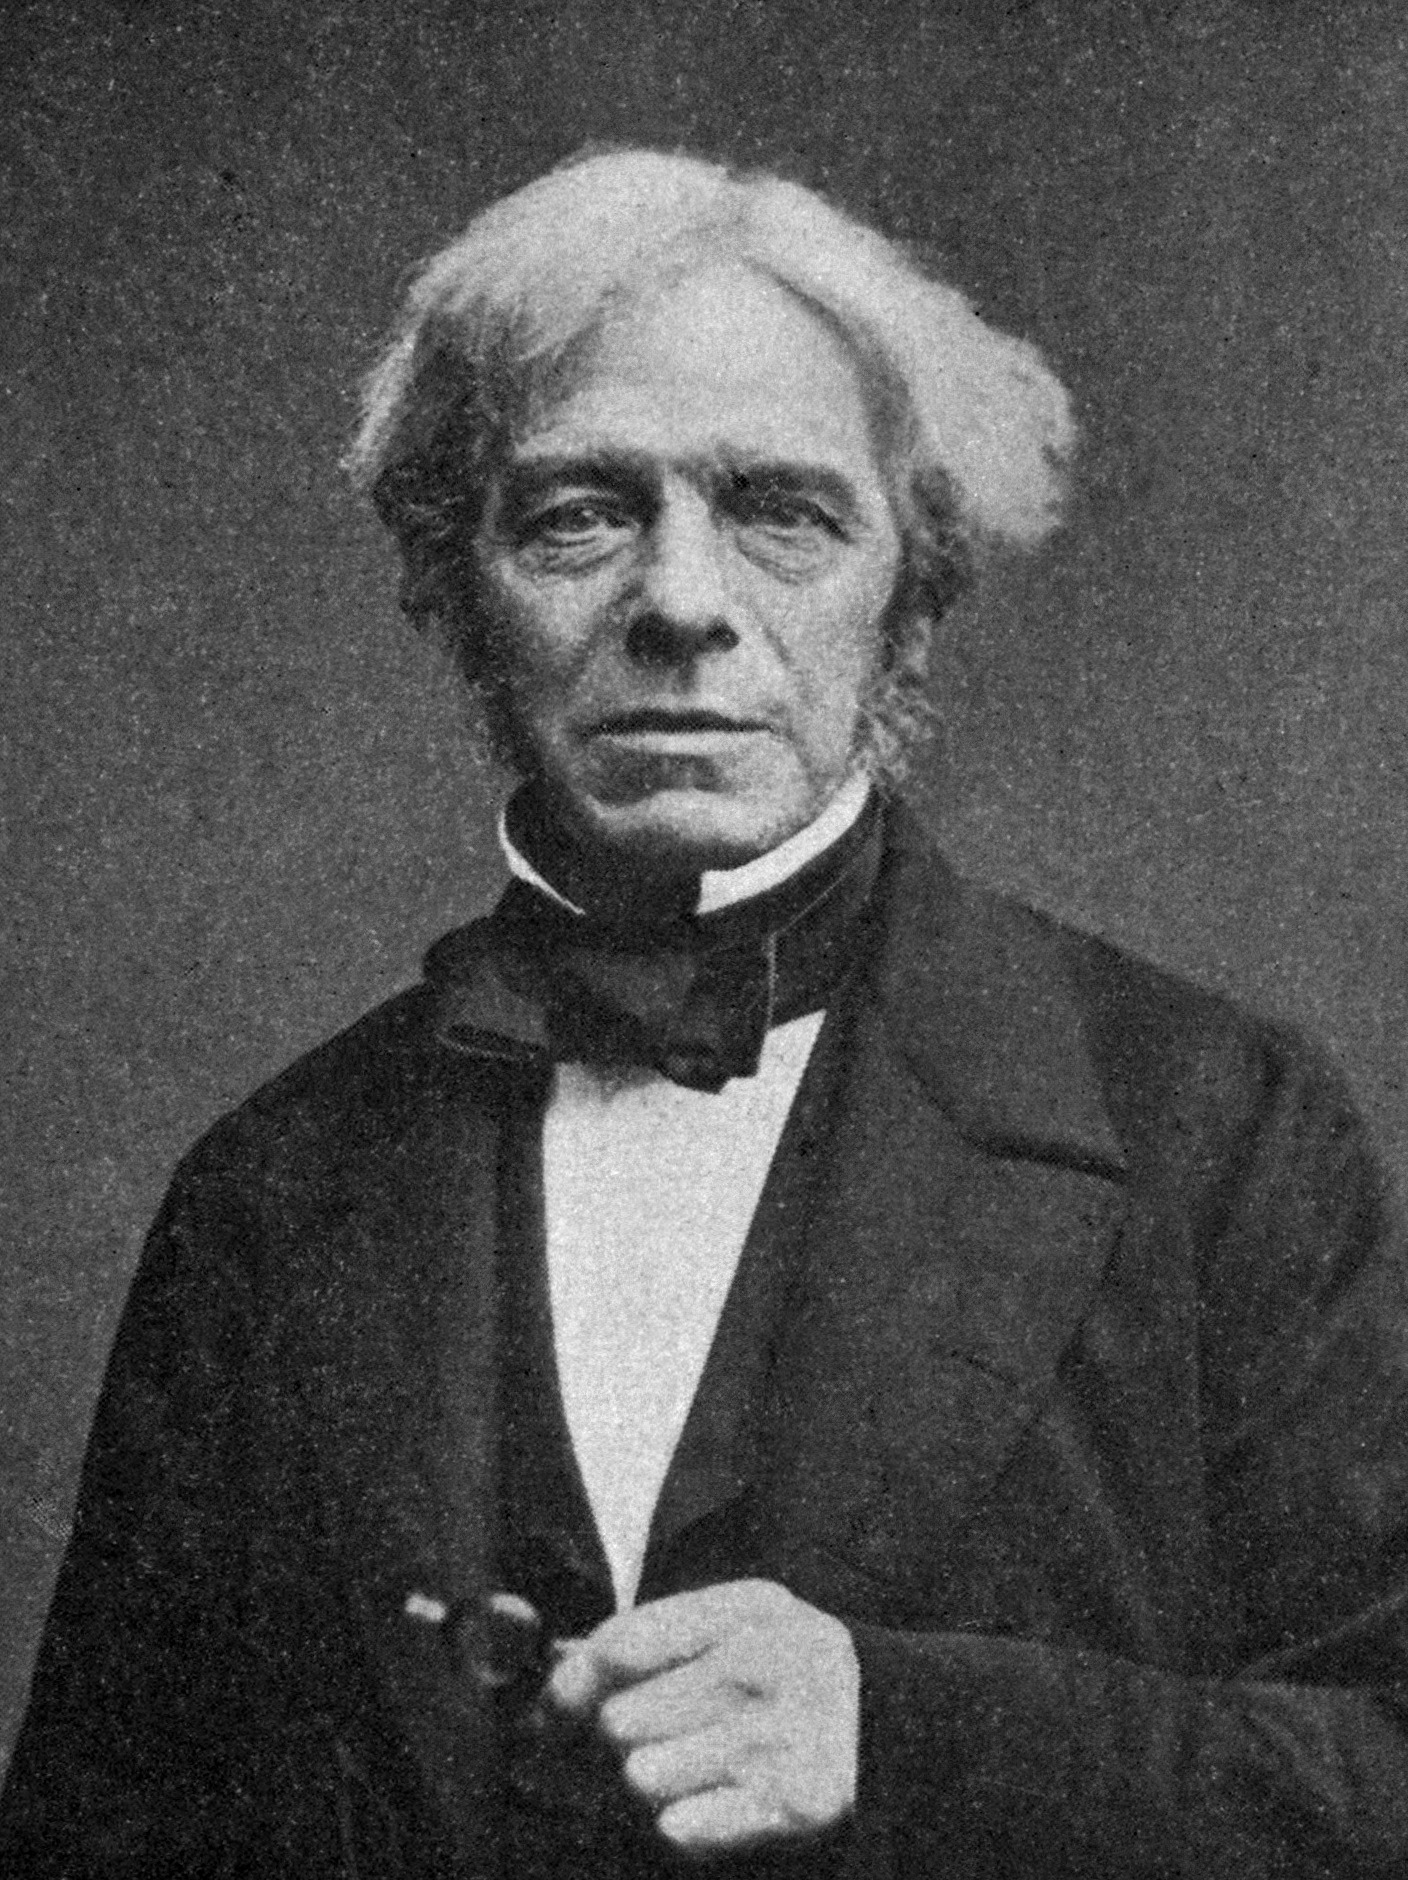 File:Faraday-Millikan-Gale-1913.jpg